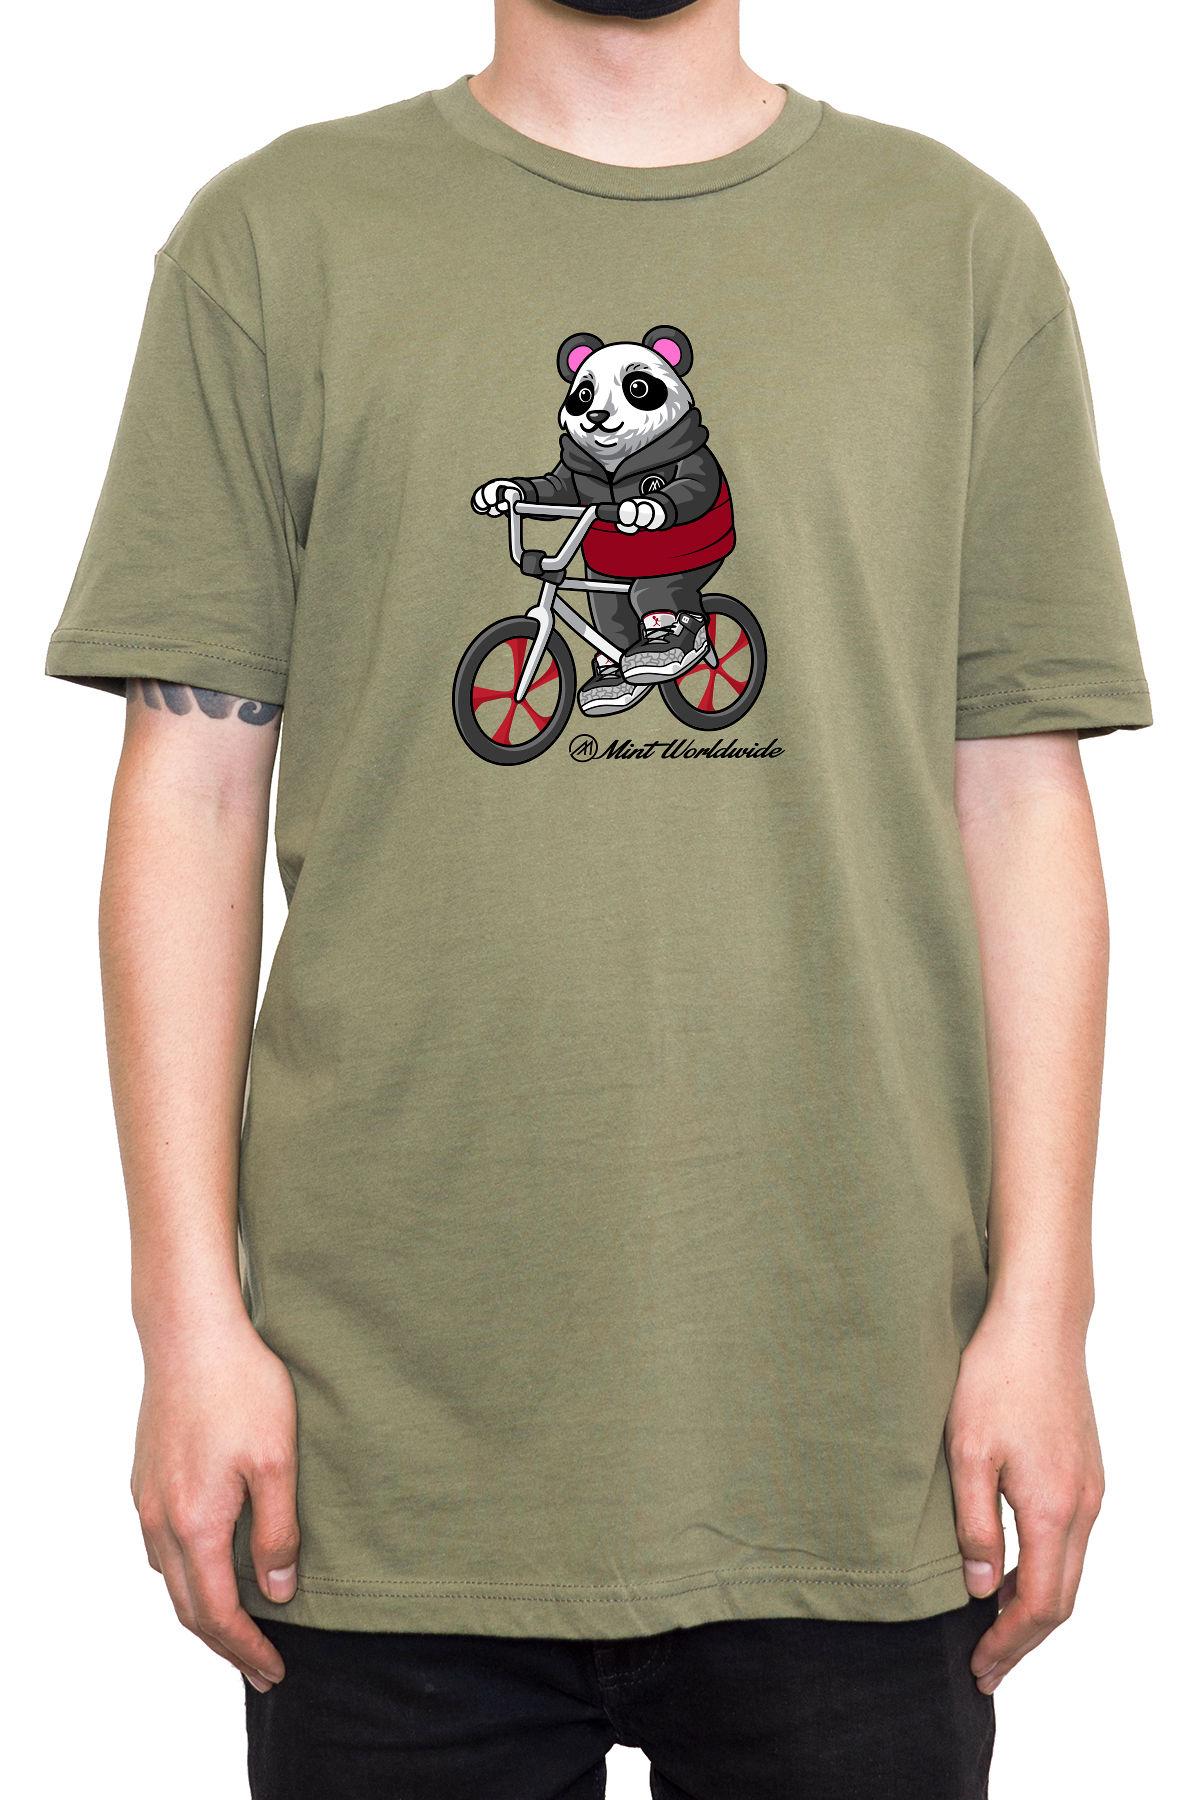 """BMX Bear T-shirt """" Army Green"""